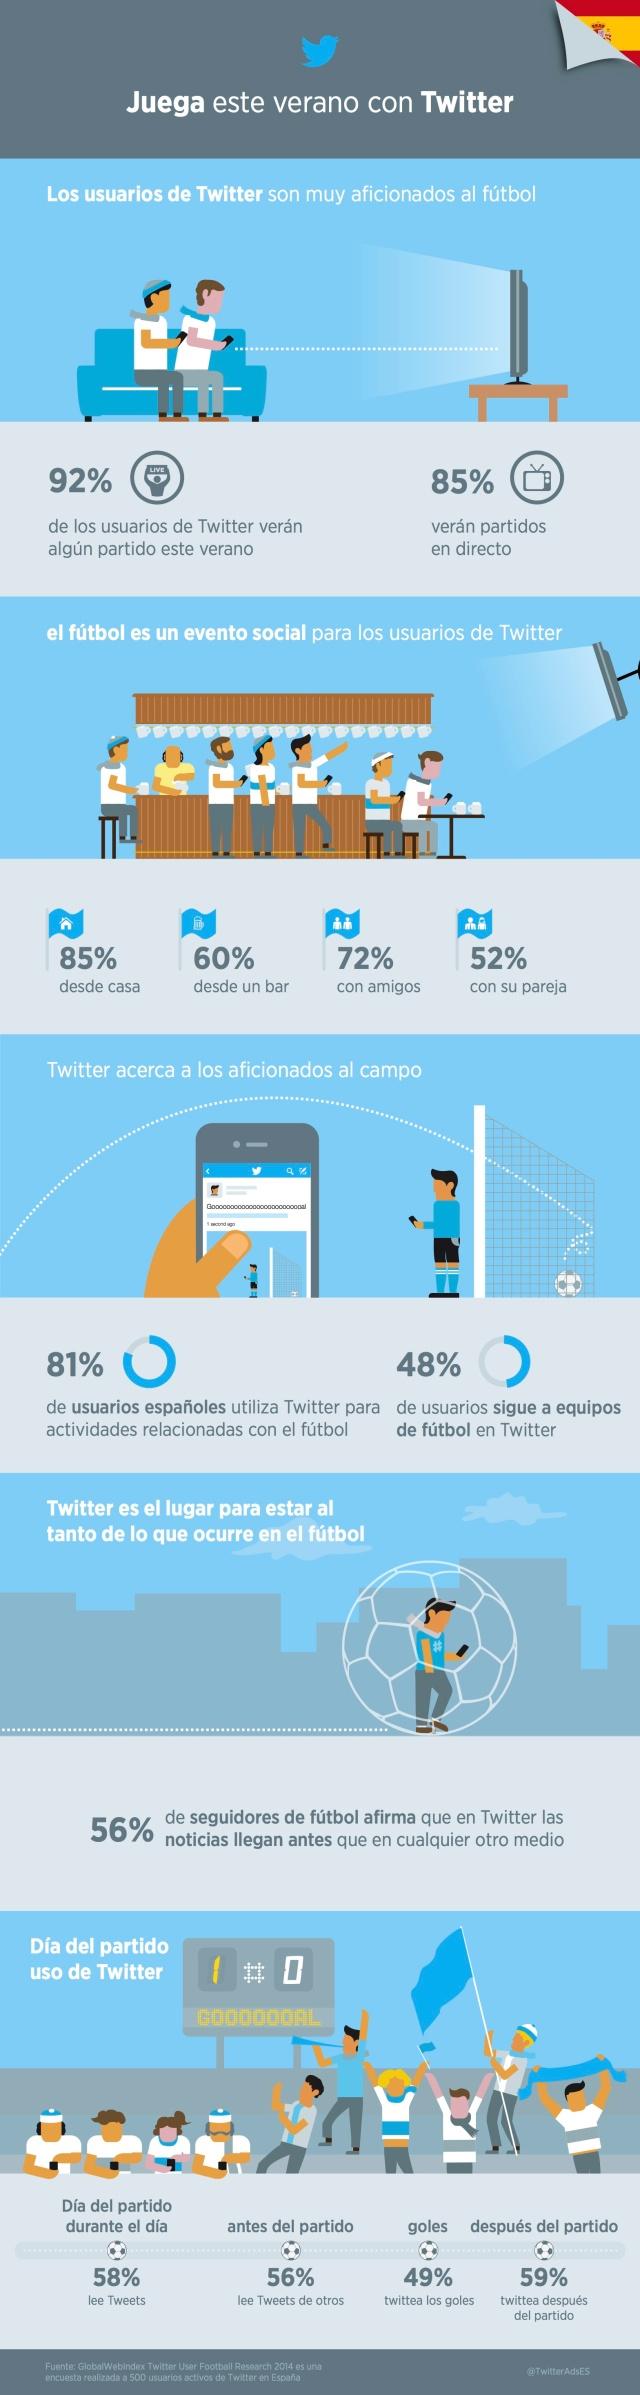 Twitter y el fútbol